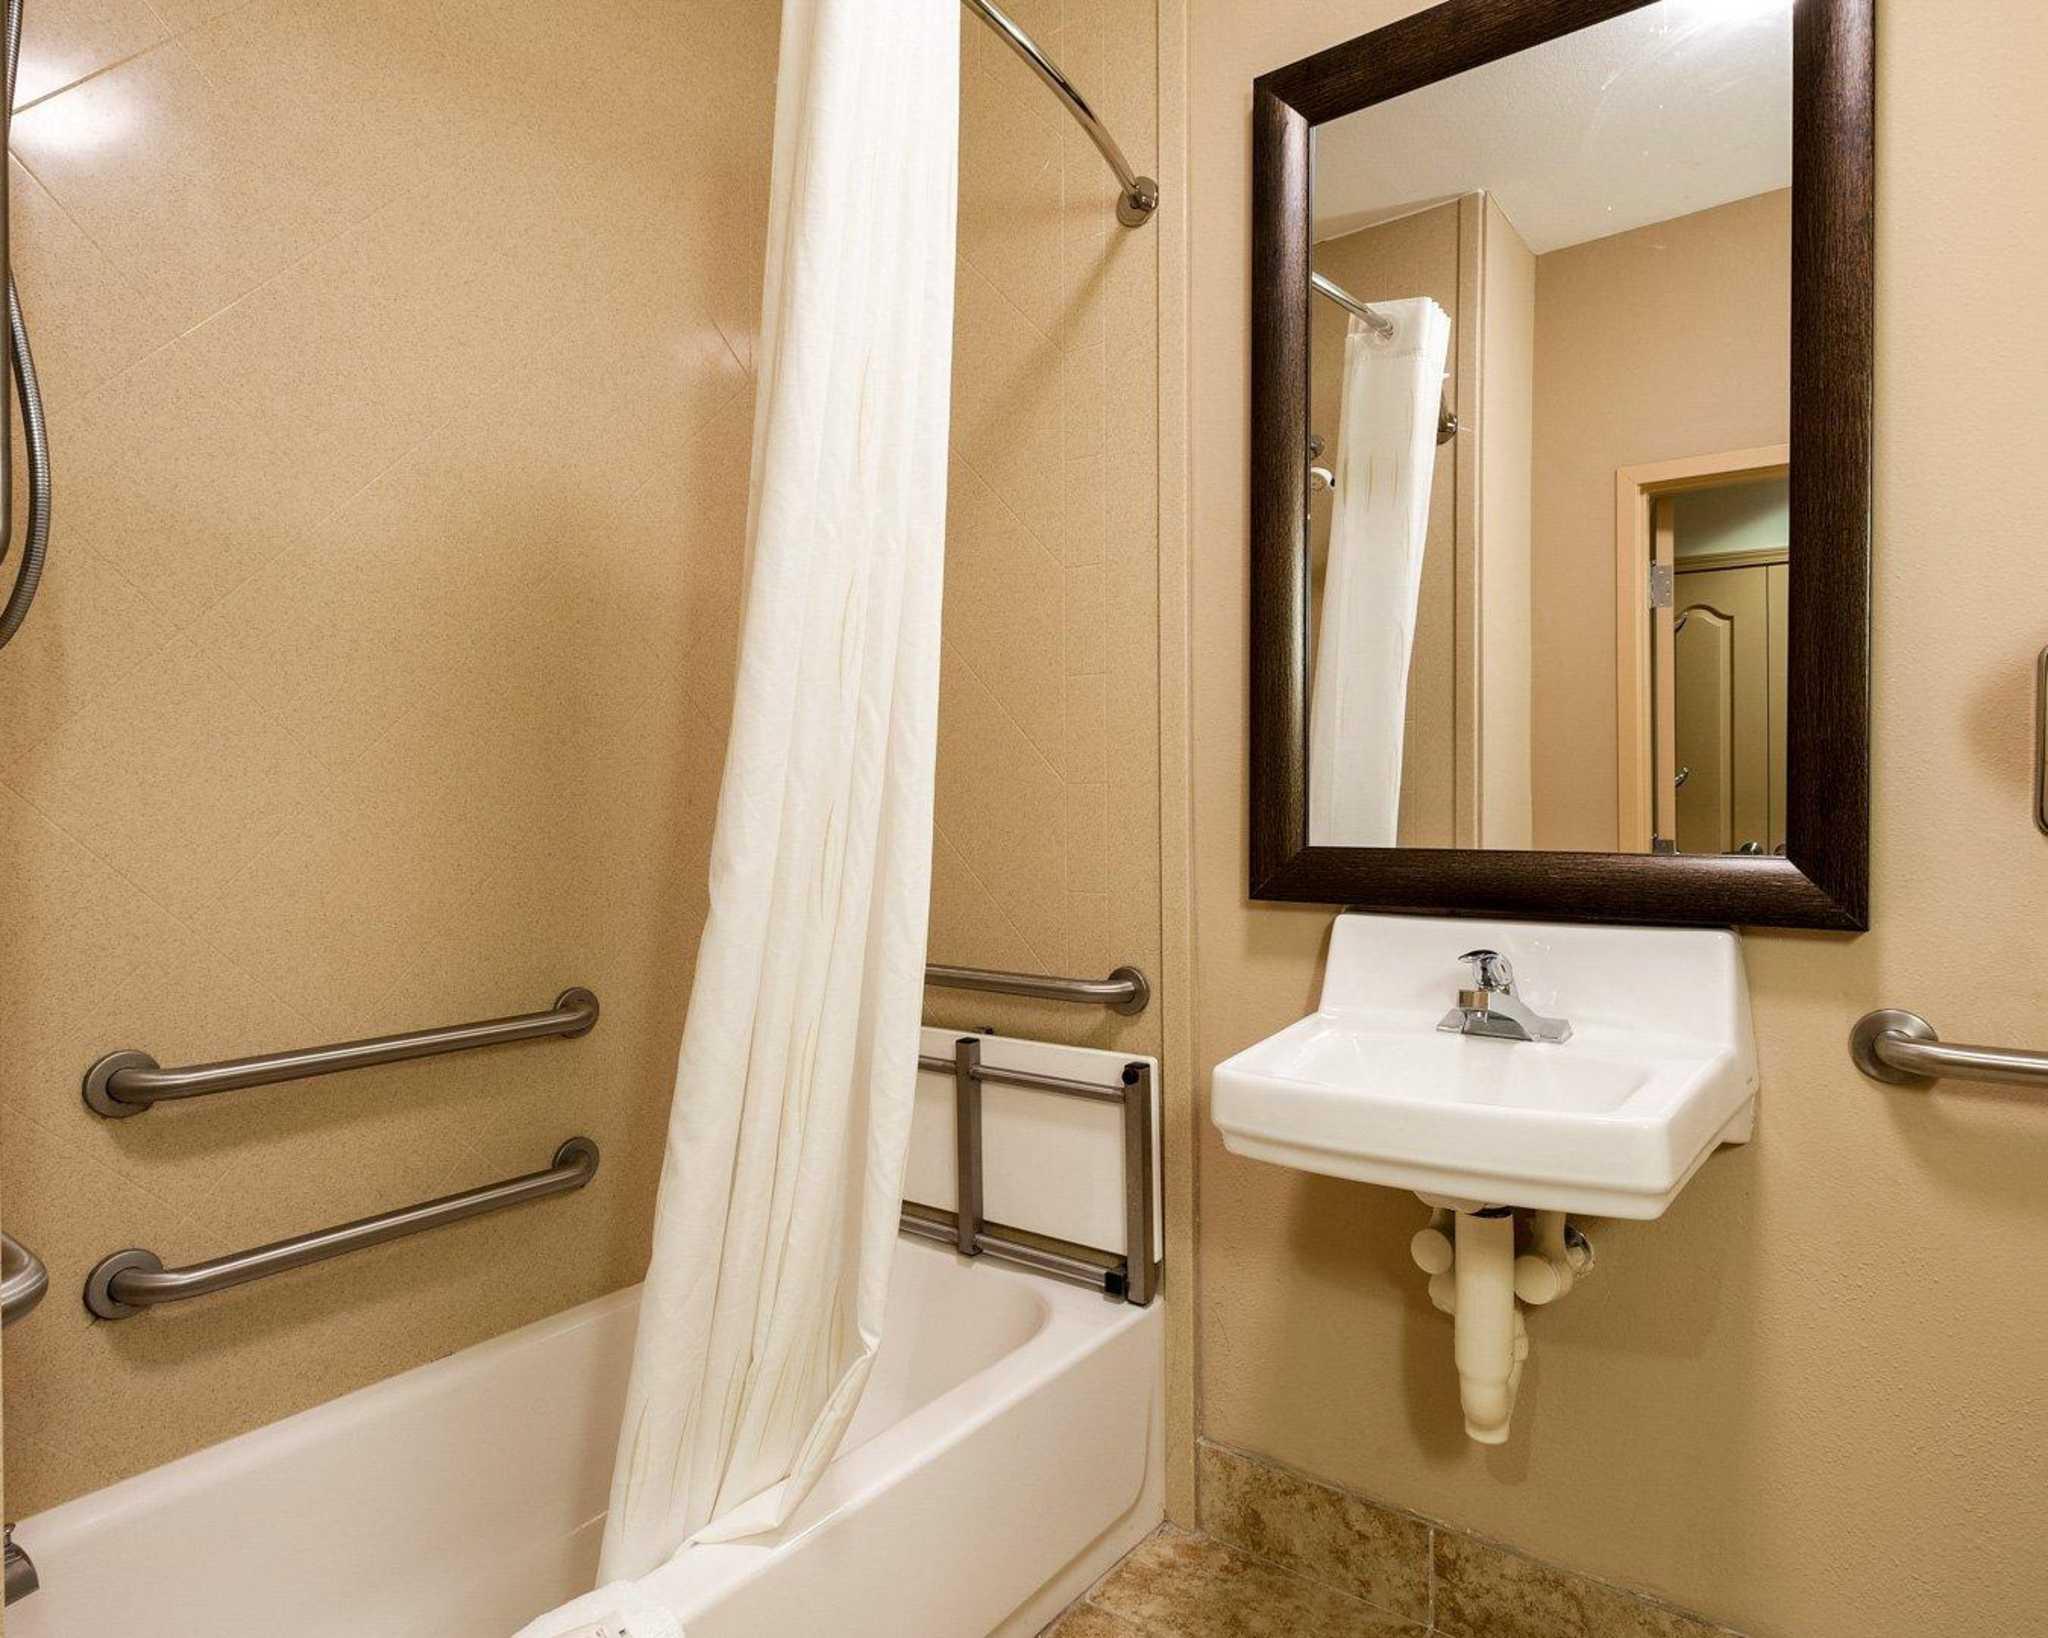 Comfort Suites image 8